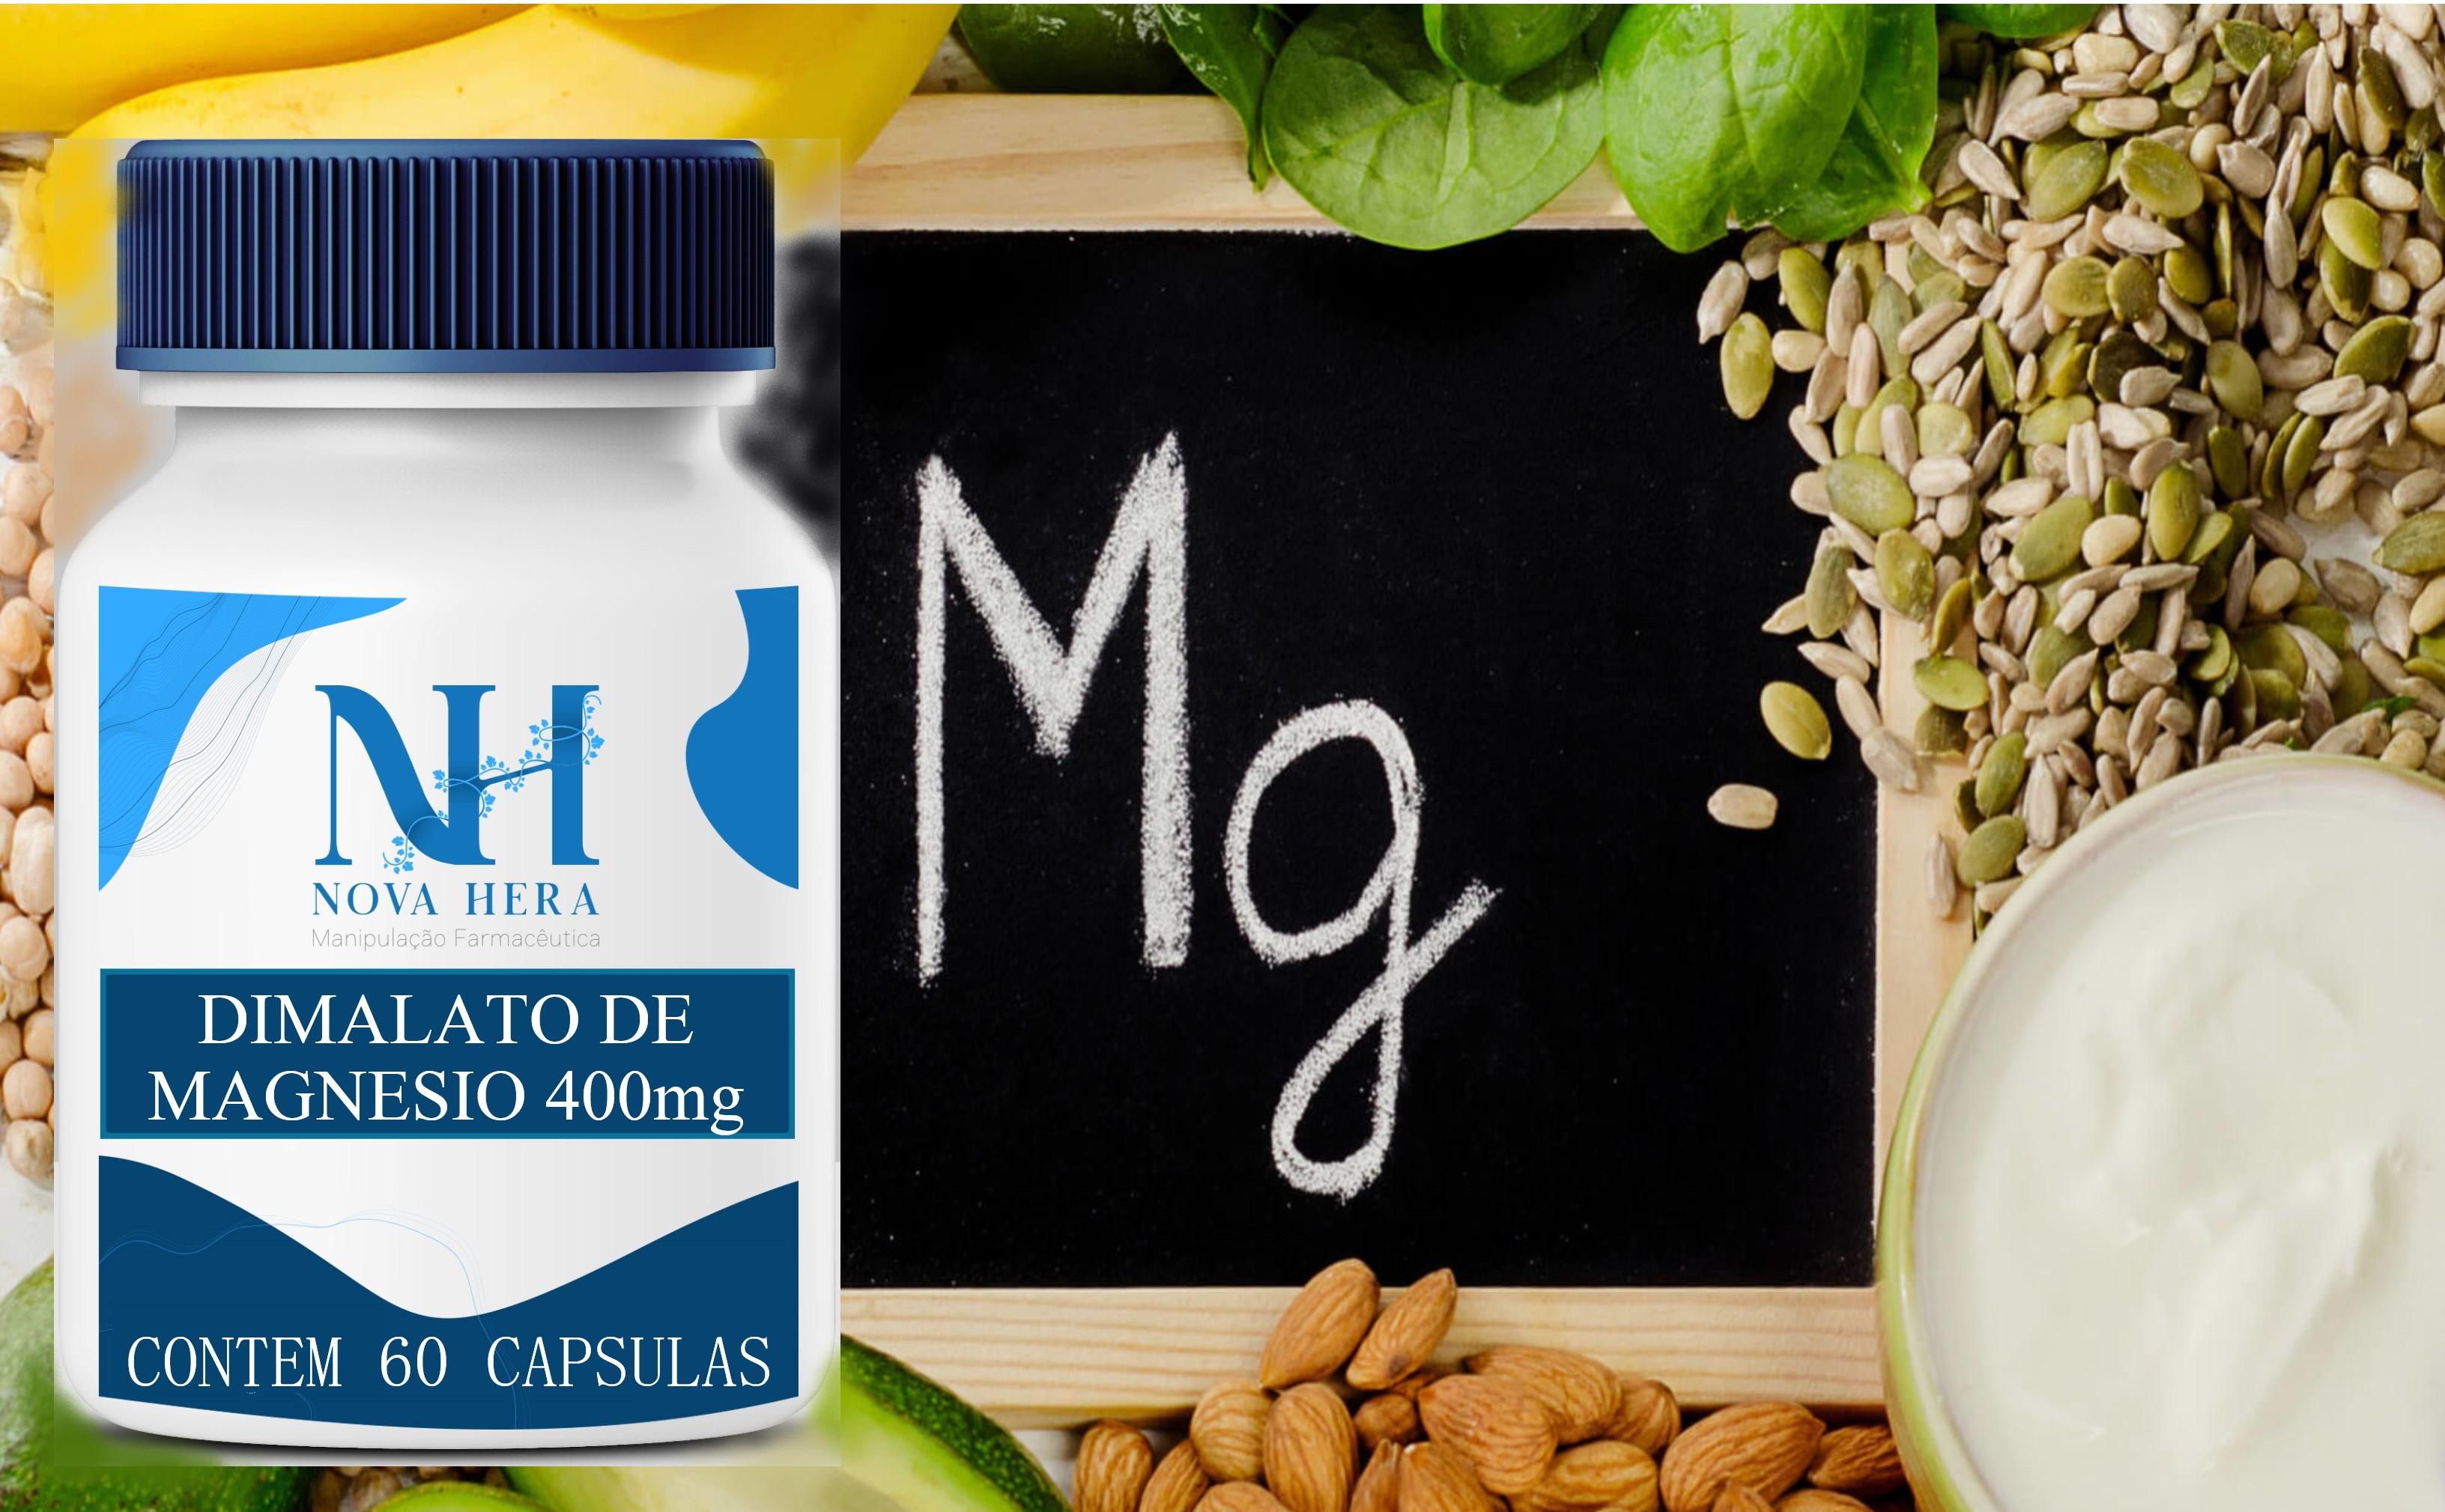 https://www.farmacianovahera.com.br/view/_upload/produto/30/1594310150dimalato-de-magnesio.jpg